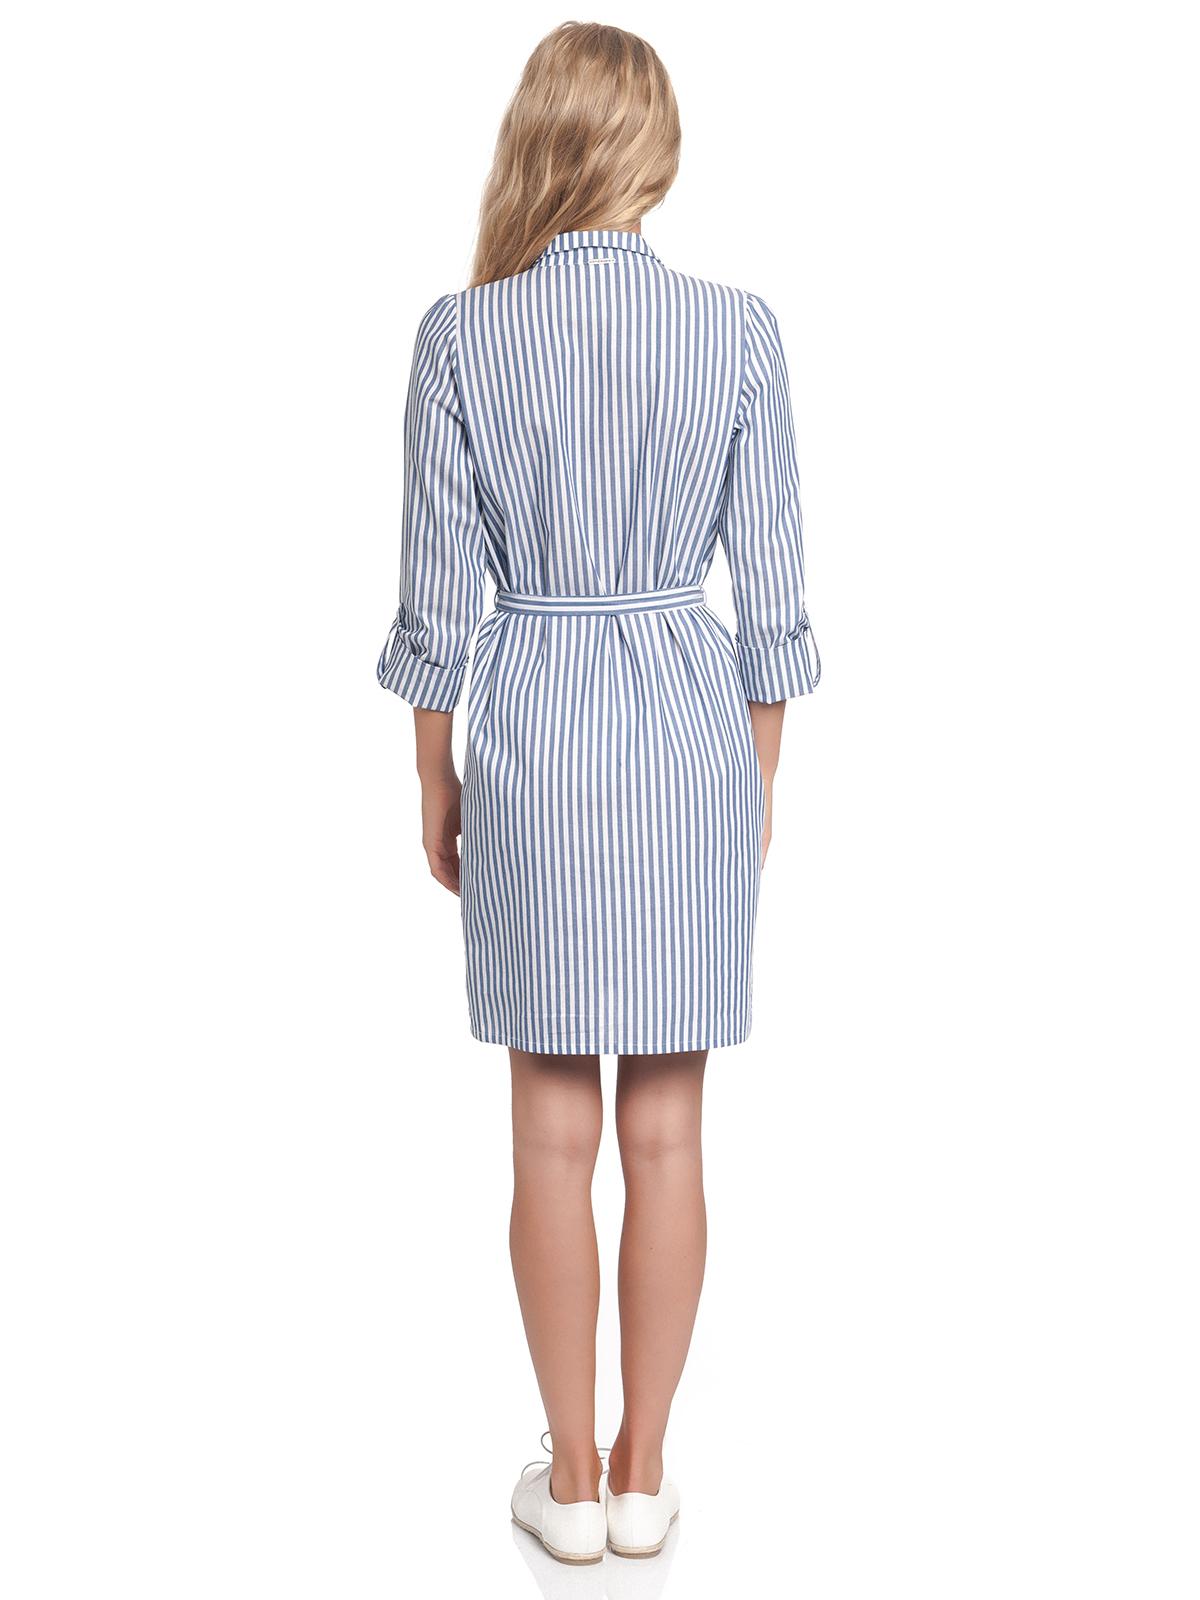 Vive Maria Voyage Dress blue//white